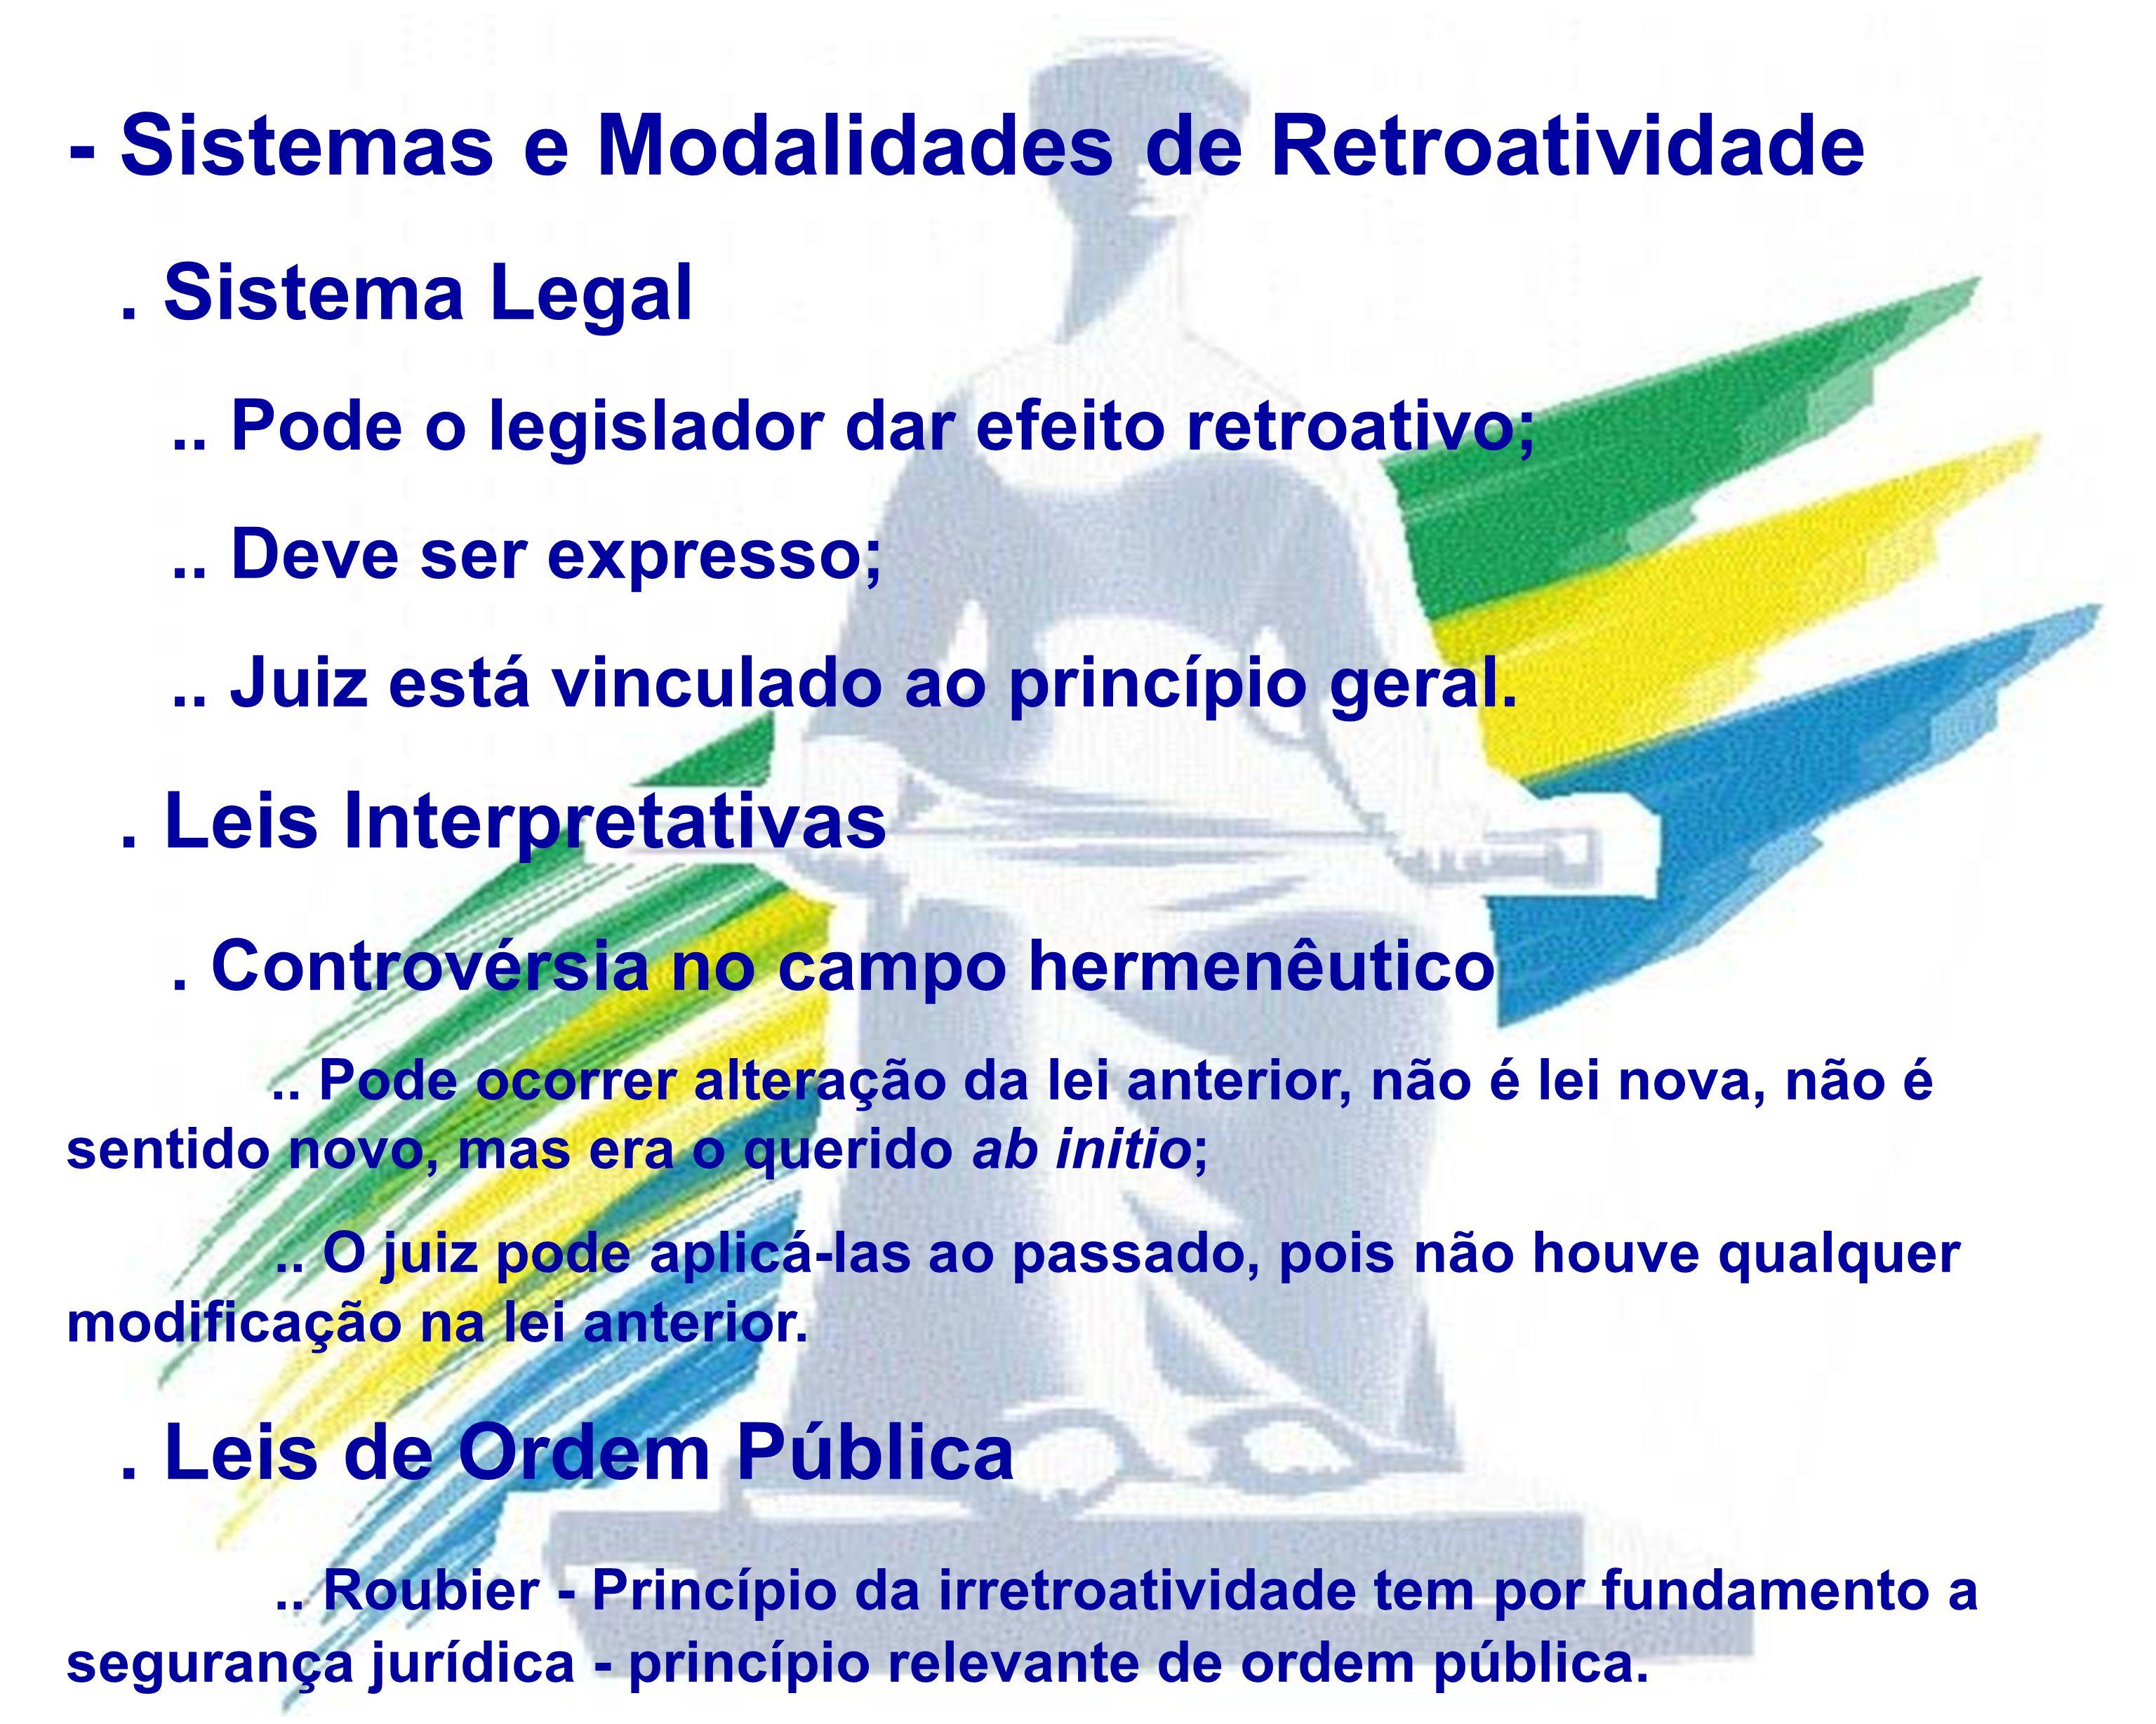 - Sistemas e Modalidades de Retroatividade